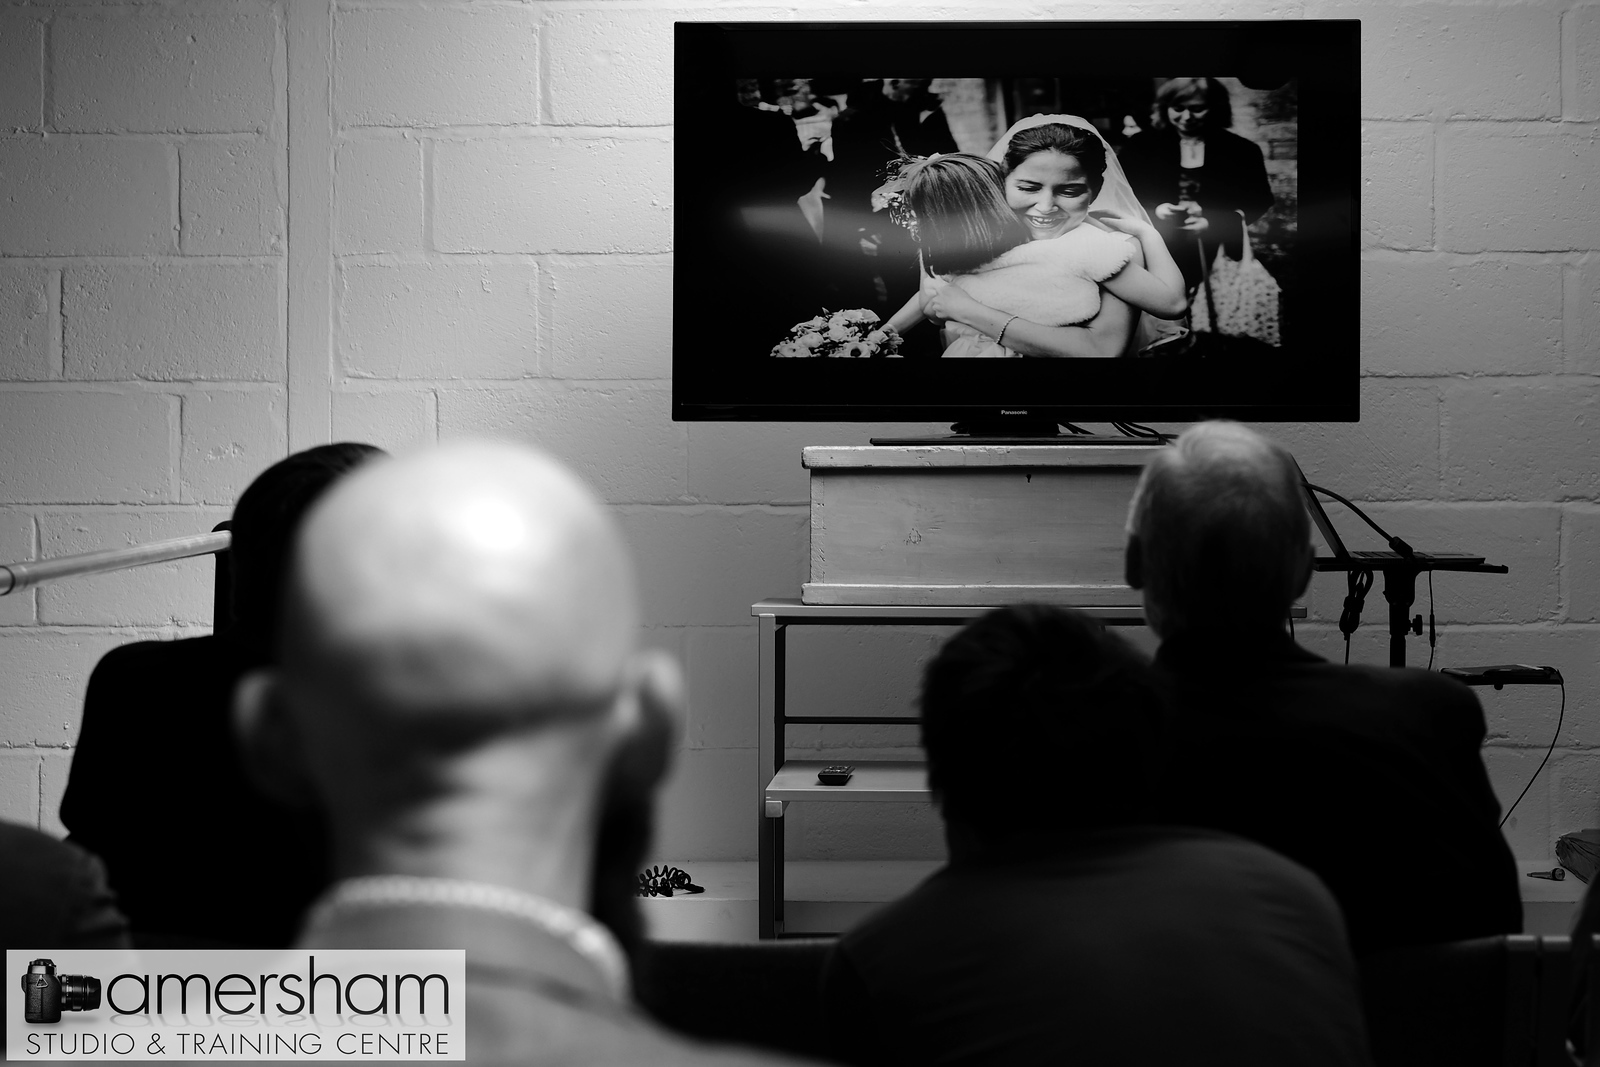 Kevin Mullins Workshops Exclusivly at Amersham Studios